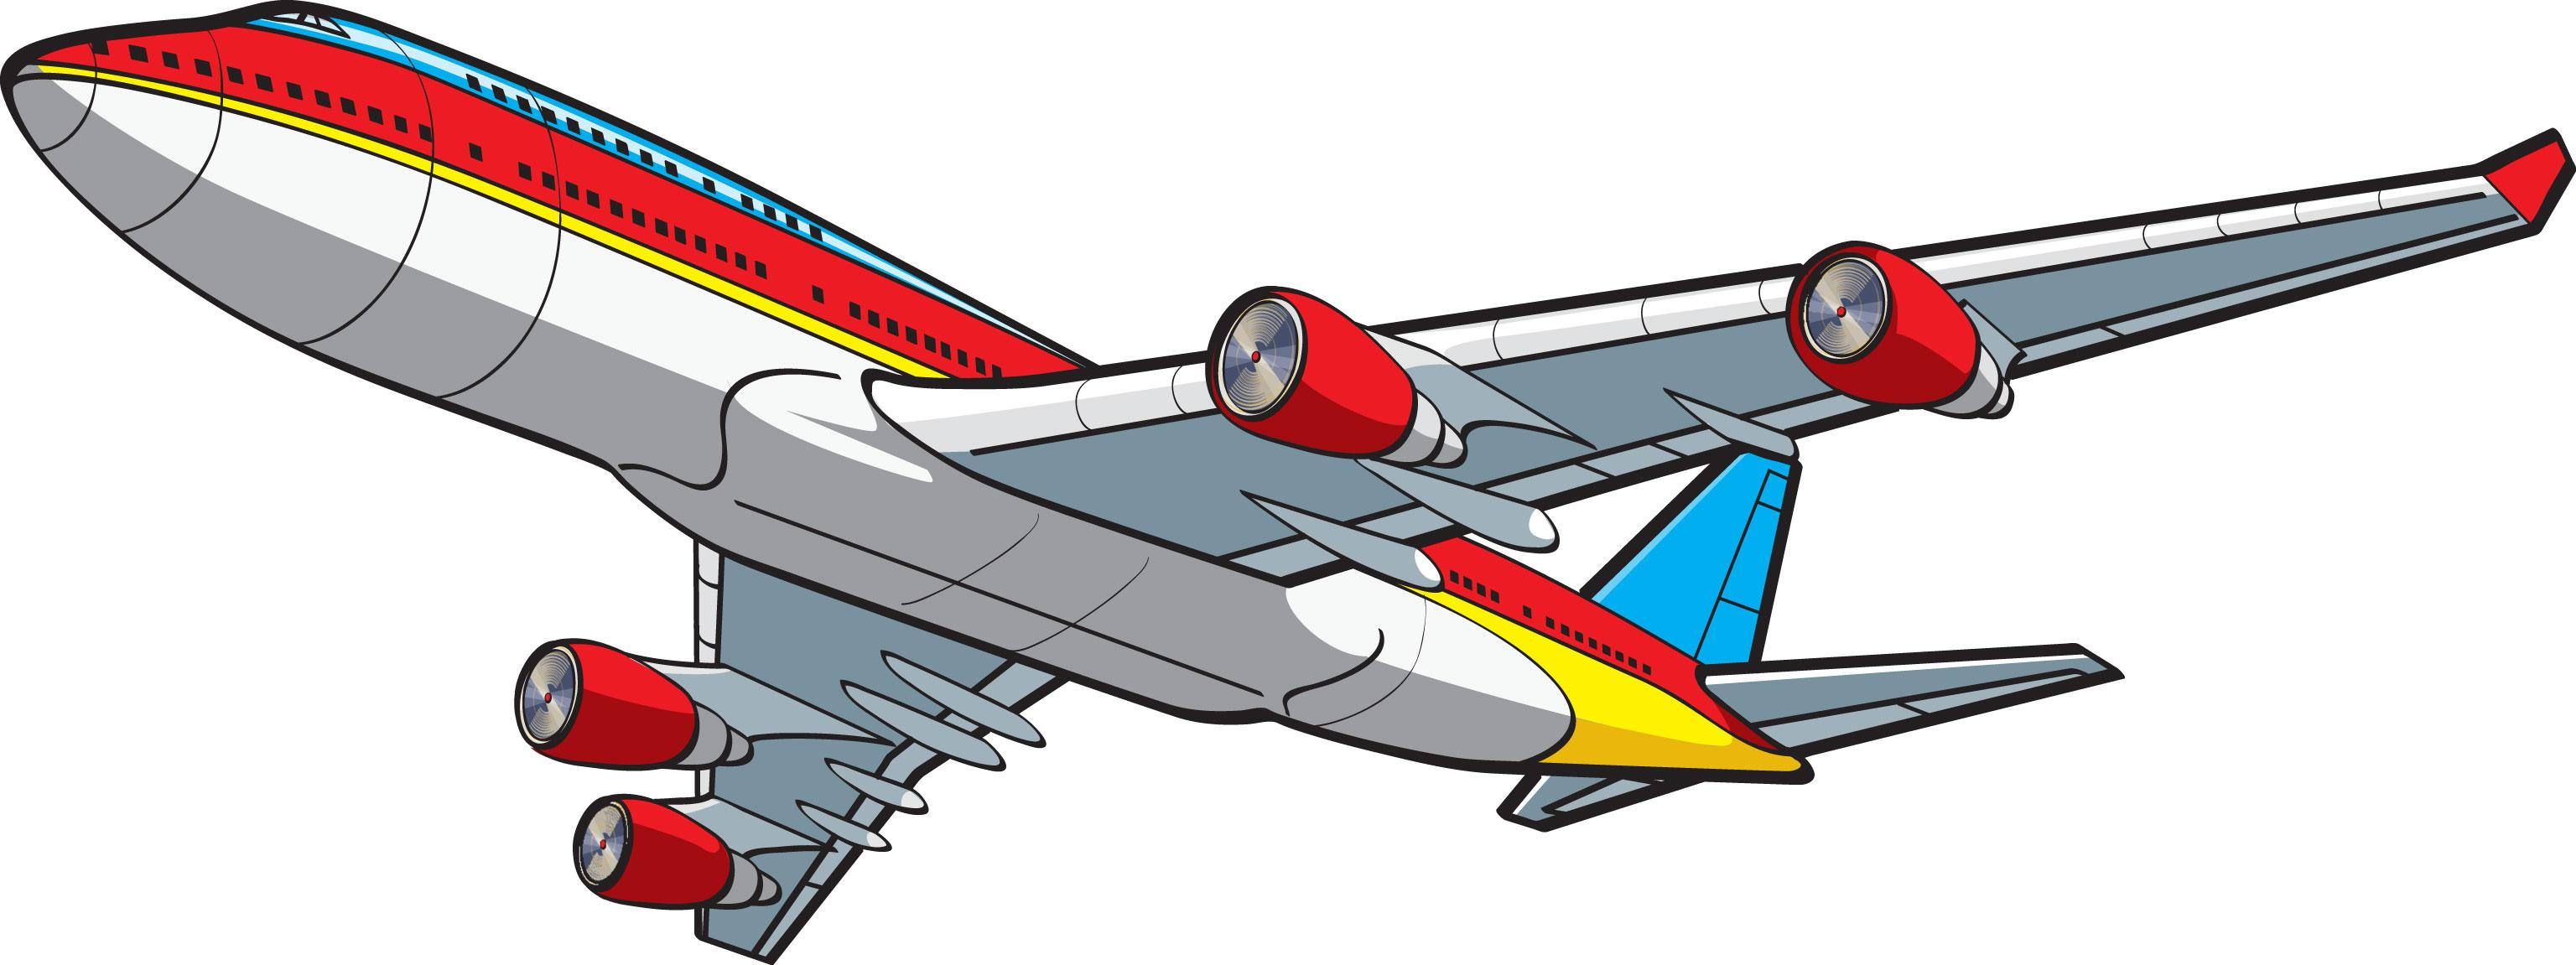 Jet clipart flight Clipart clipart Flight flight Jet